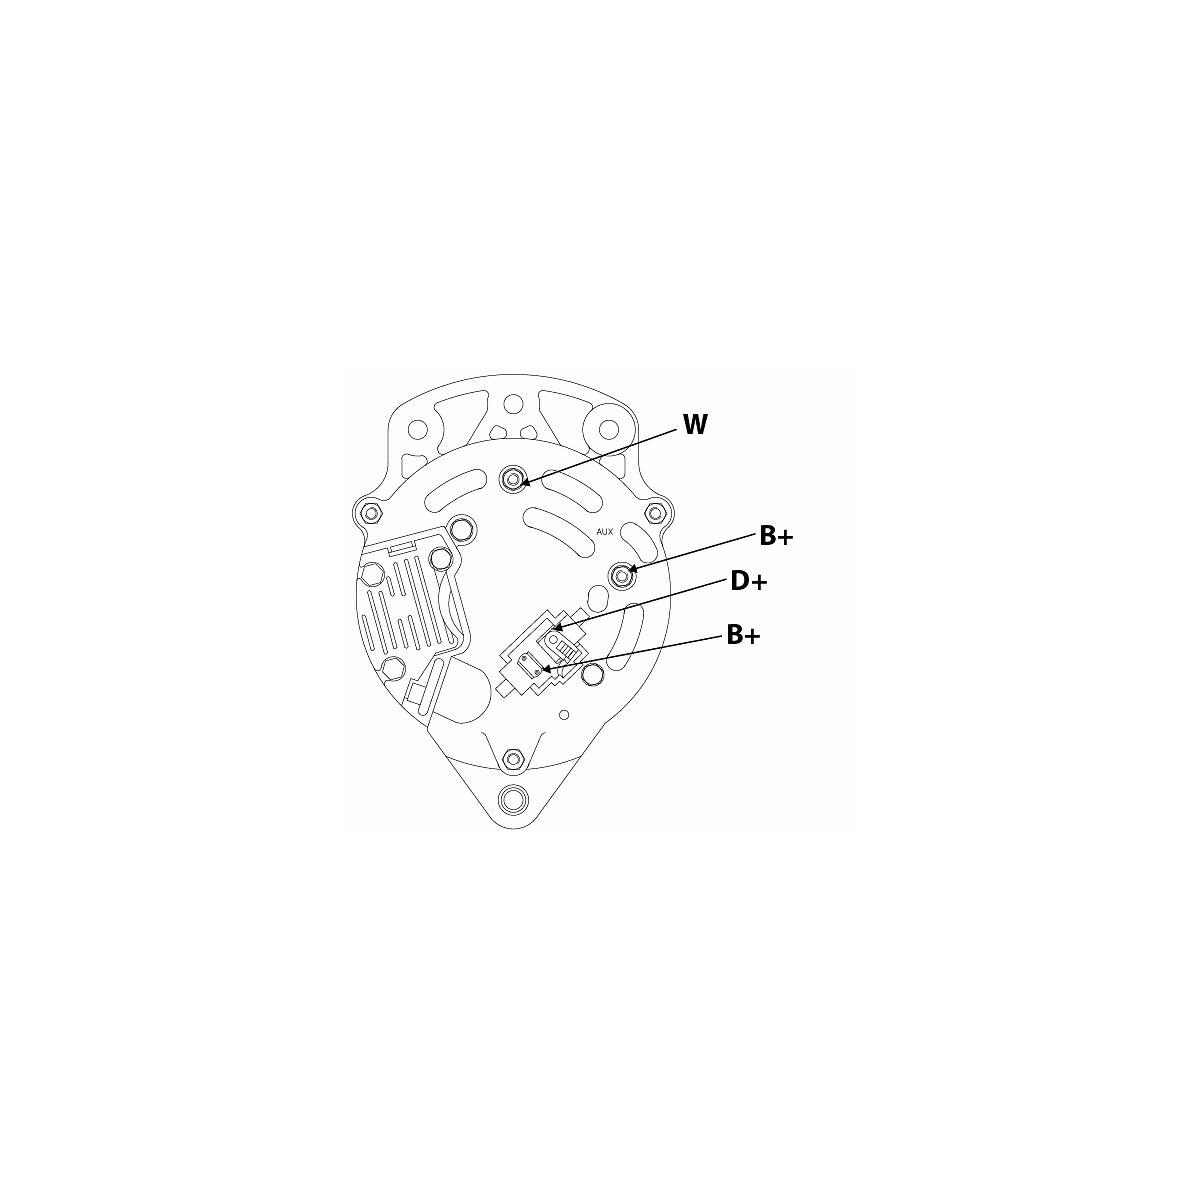 Alternator 65a Universal St0210 Ikh 885 Case Tractor Starter Wiring Diagram Laturi Yleismalli